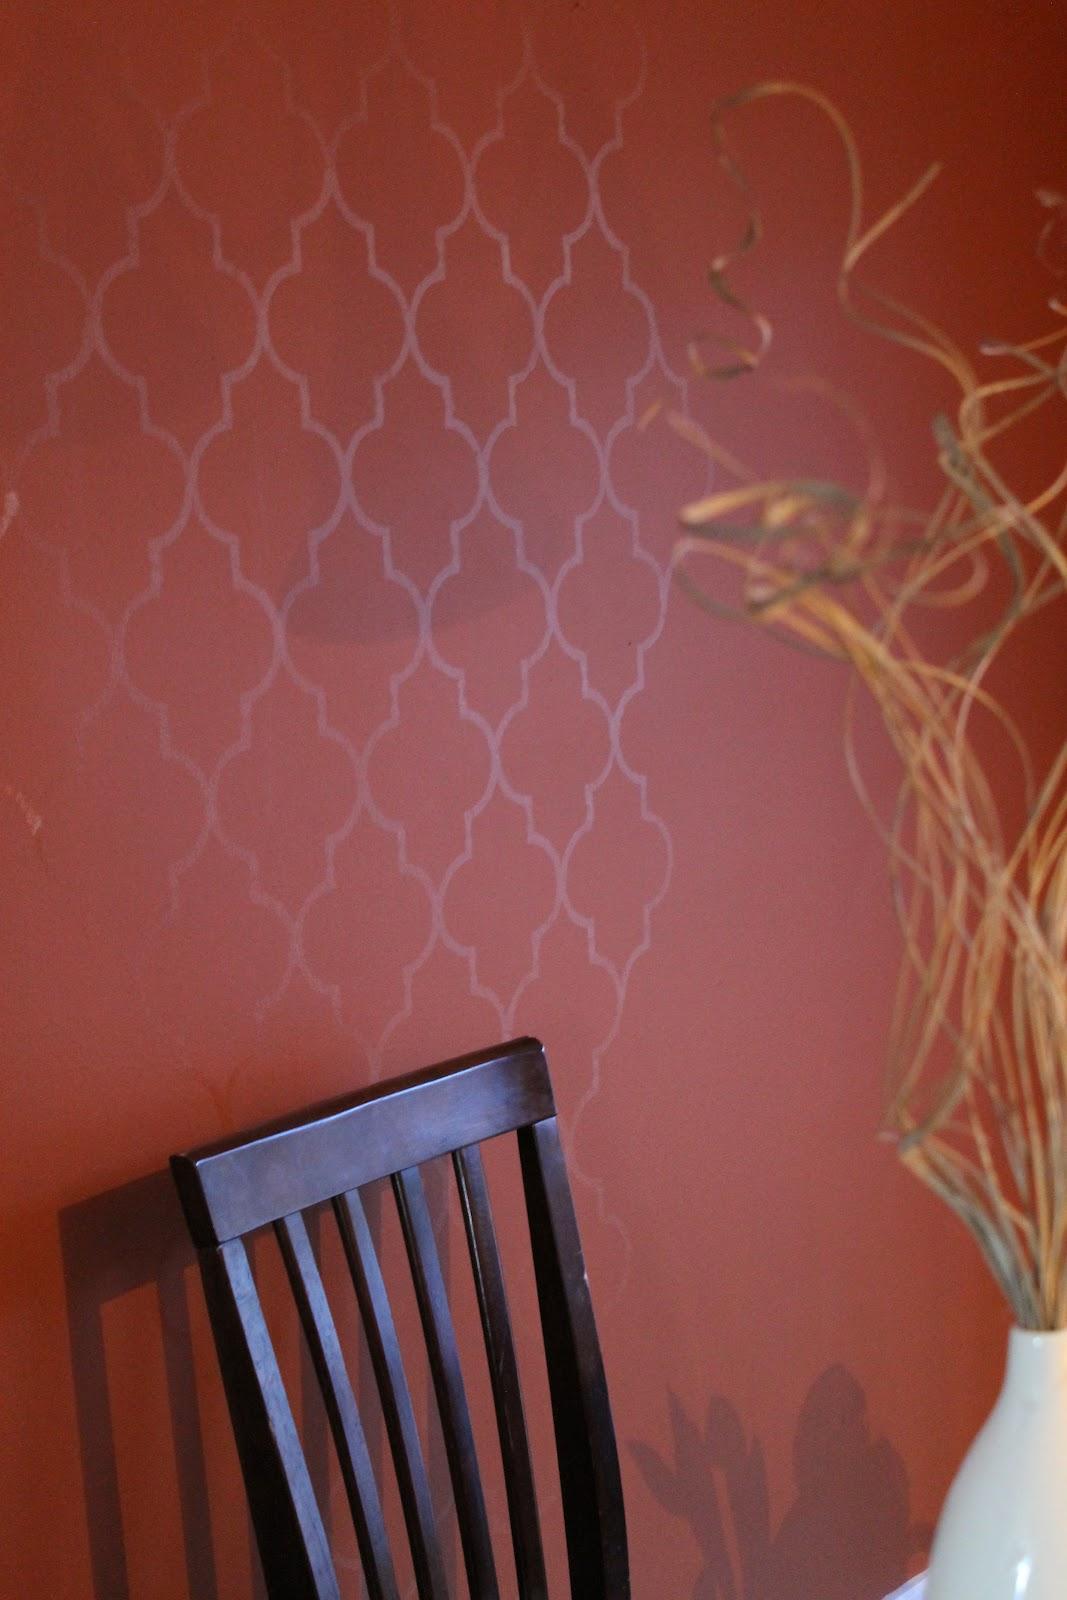 Diy Painted Stencil Bathroom Floor: 301 Moved Permanently